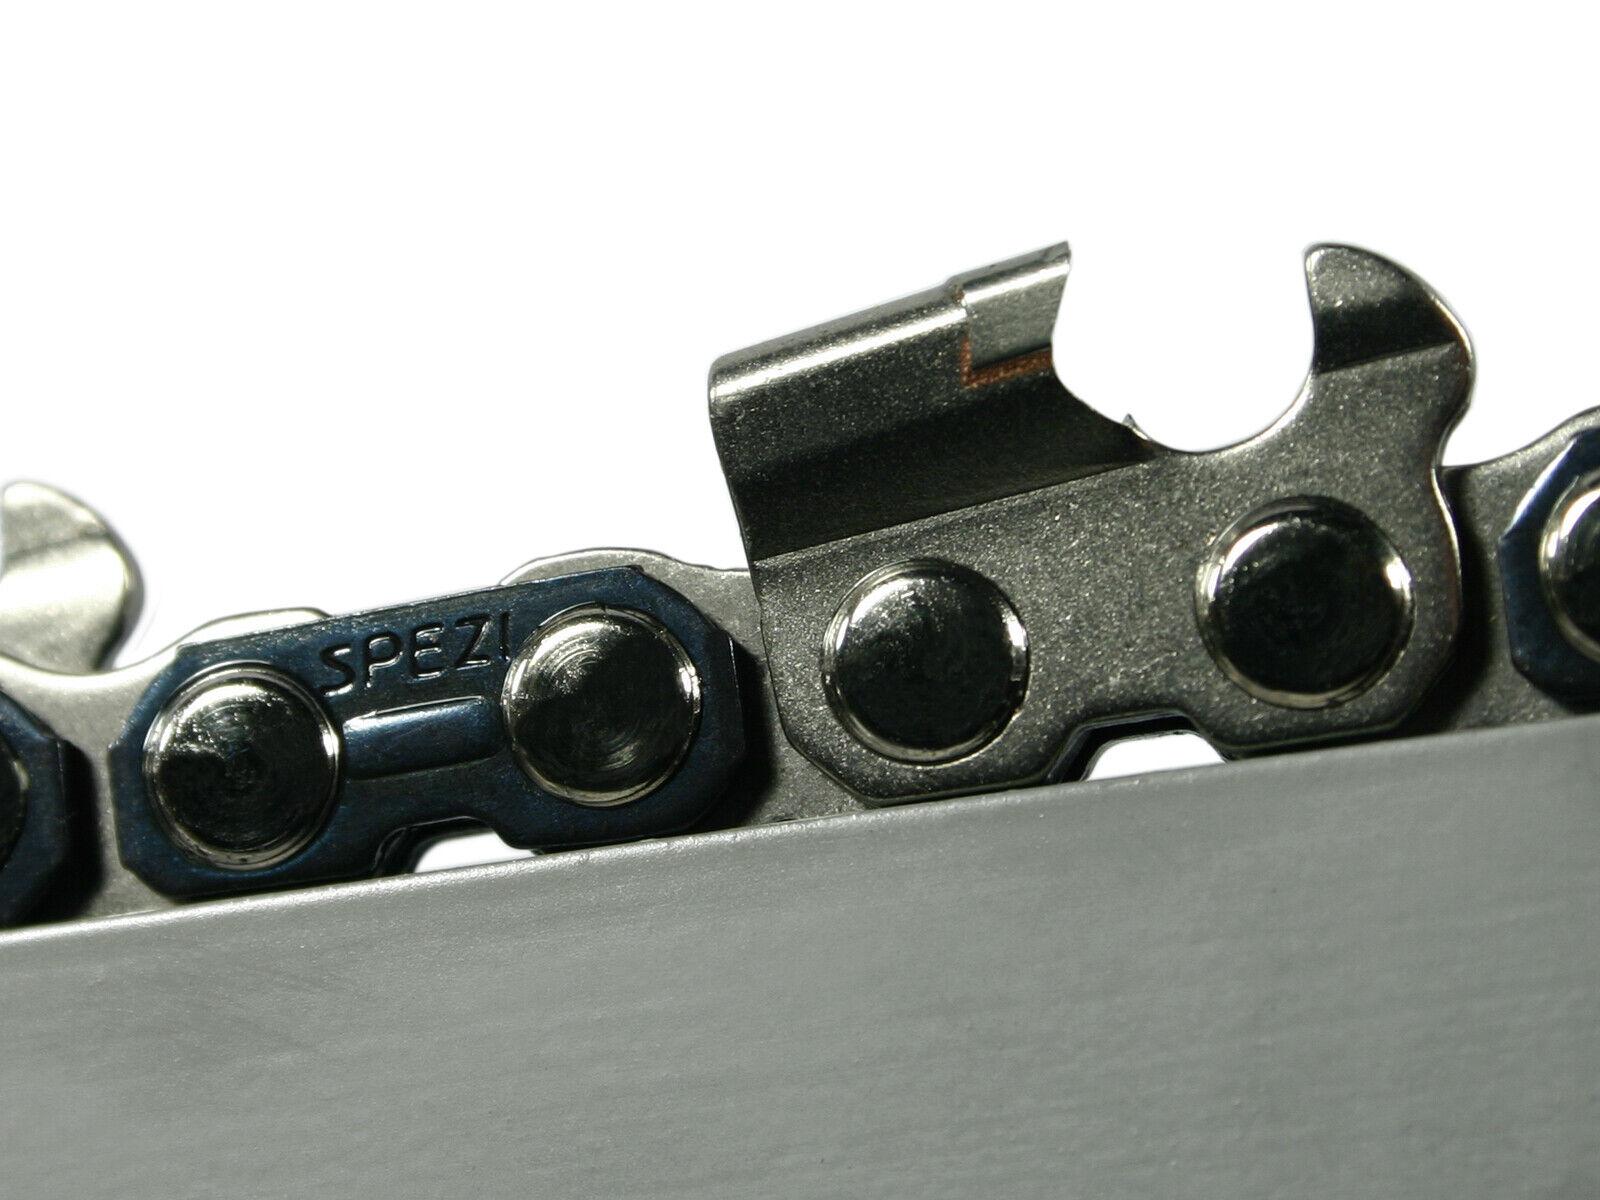 Metal duro cadena sierra adecuado para Husqvarna e1400 43 cm 3 8  64 TG 1,5 mm Chain